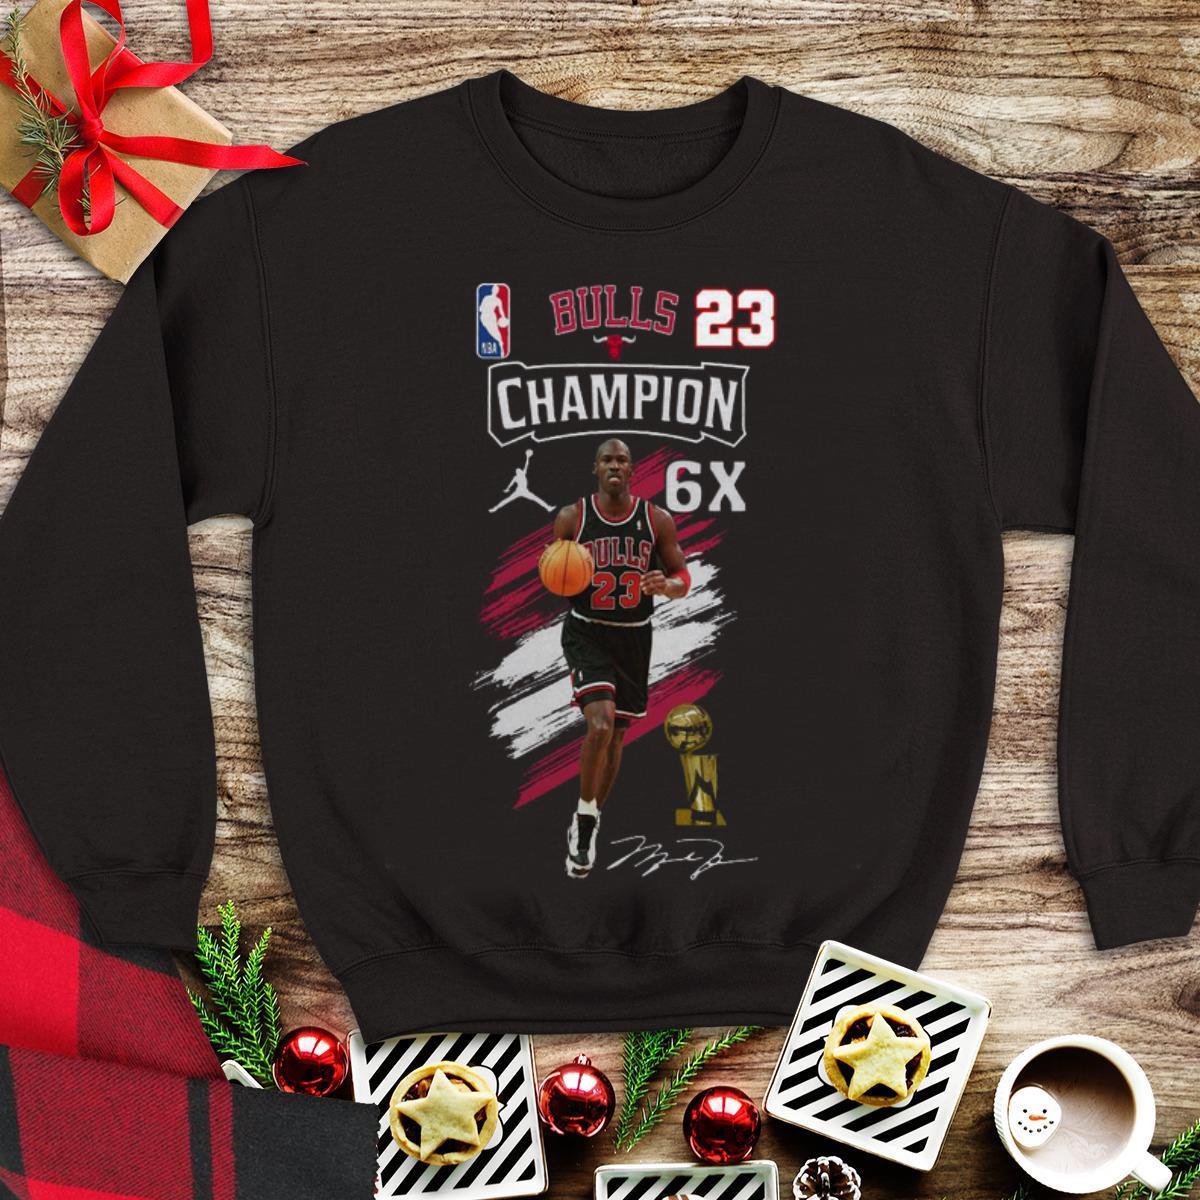 chicago bulls t shirts walmart